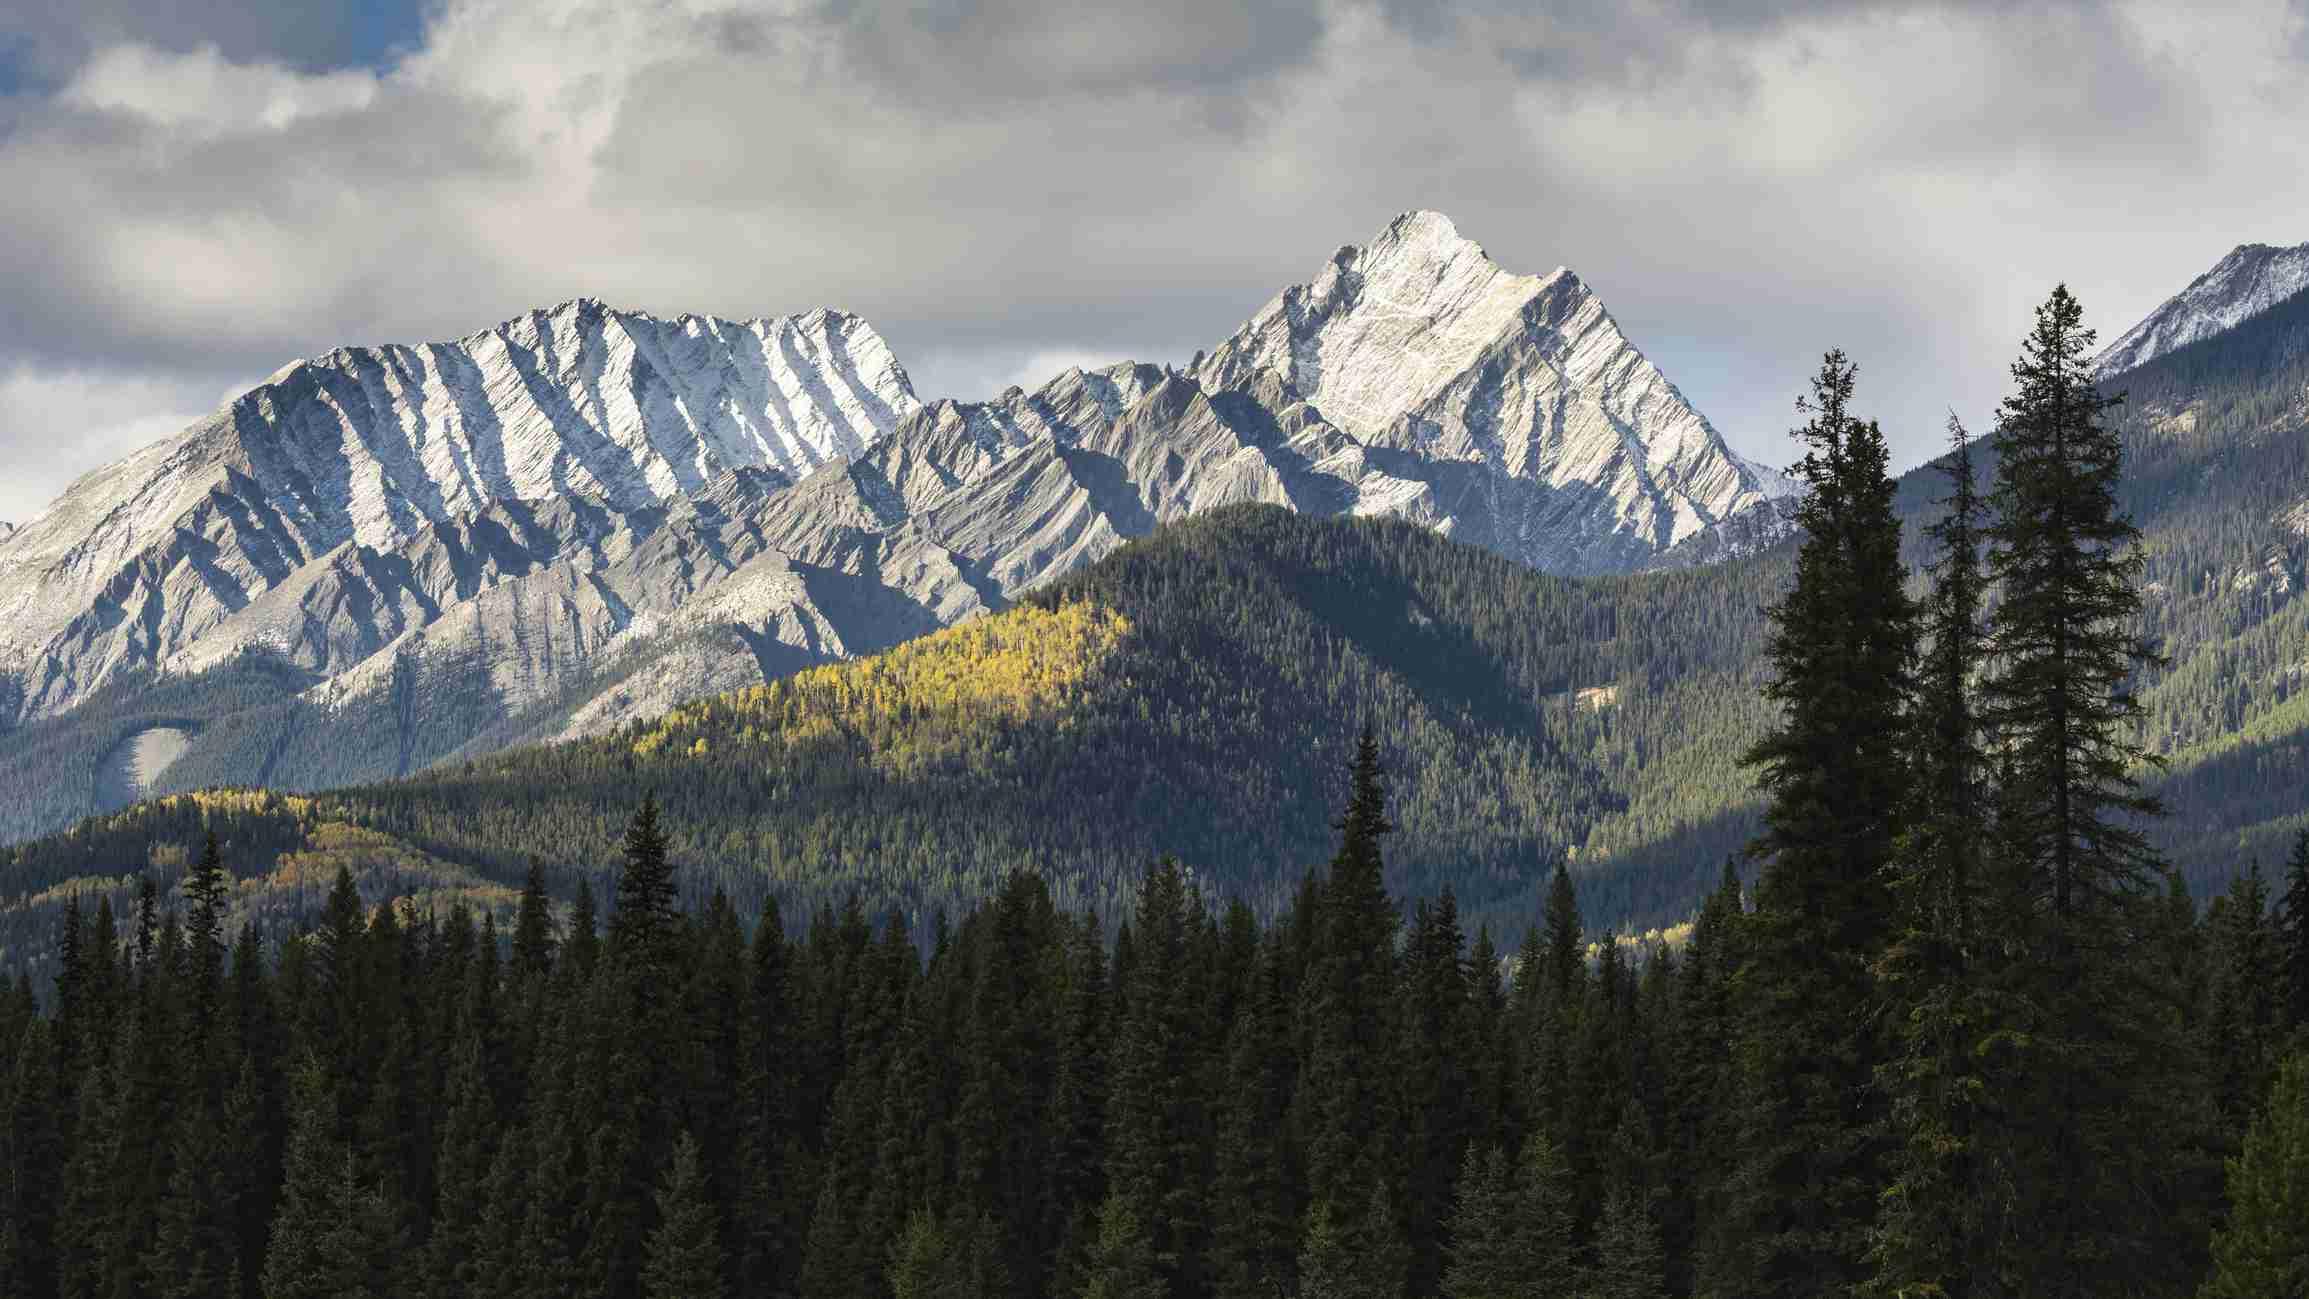 Selkirk Mountain Range in Kootenays